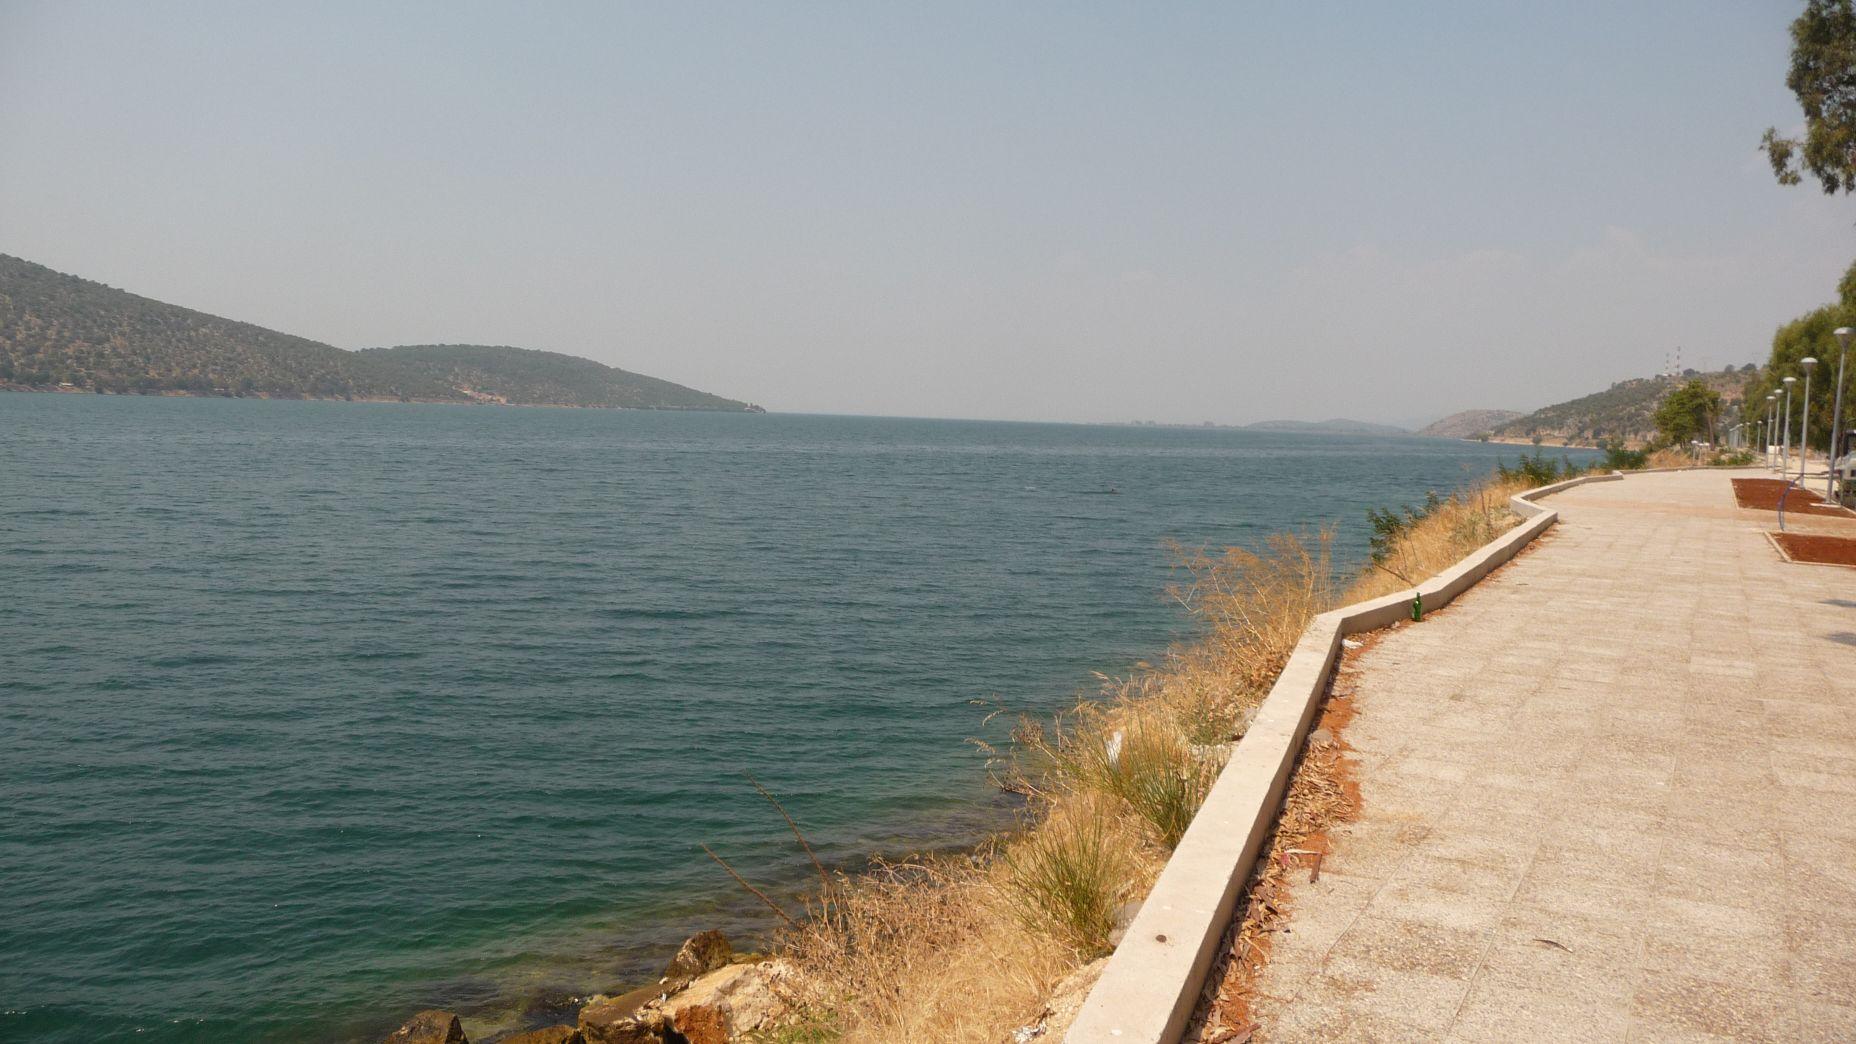 Grecja - Zatoka Ambrakijska - zdjęcia, atrakcje